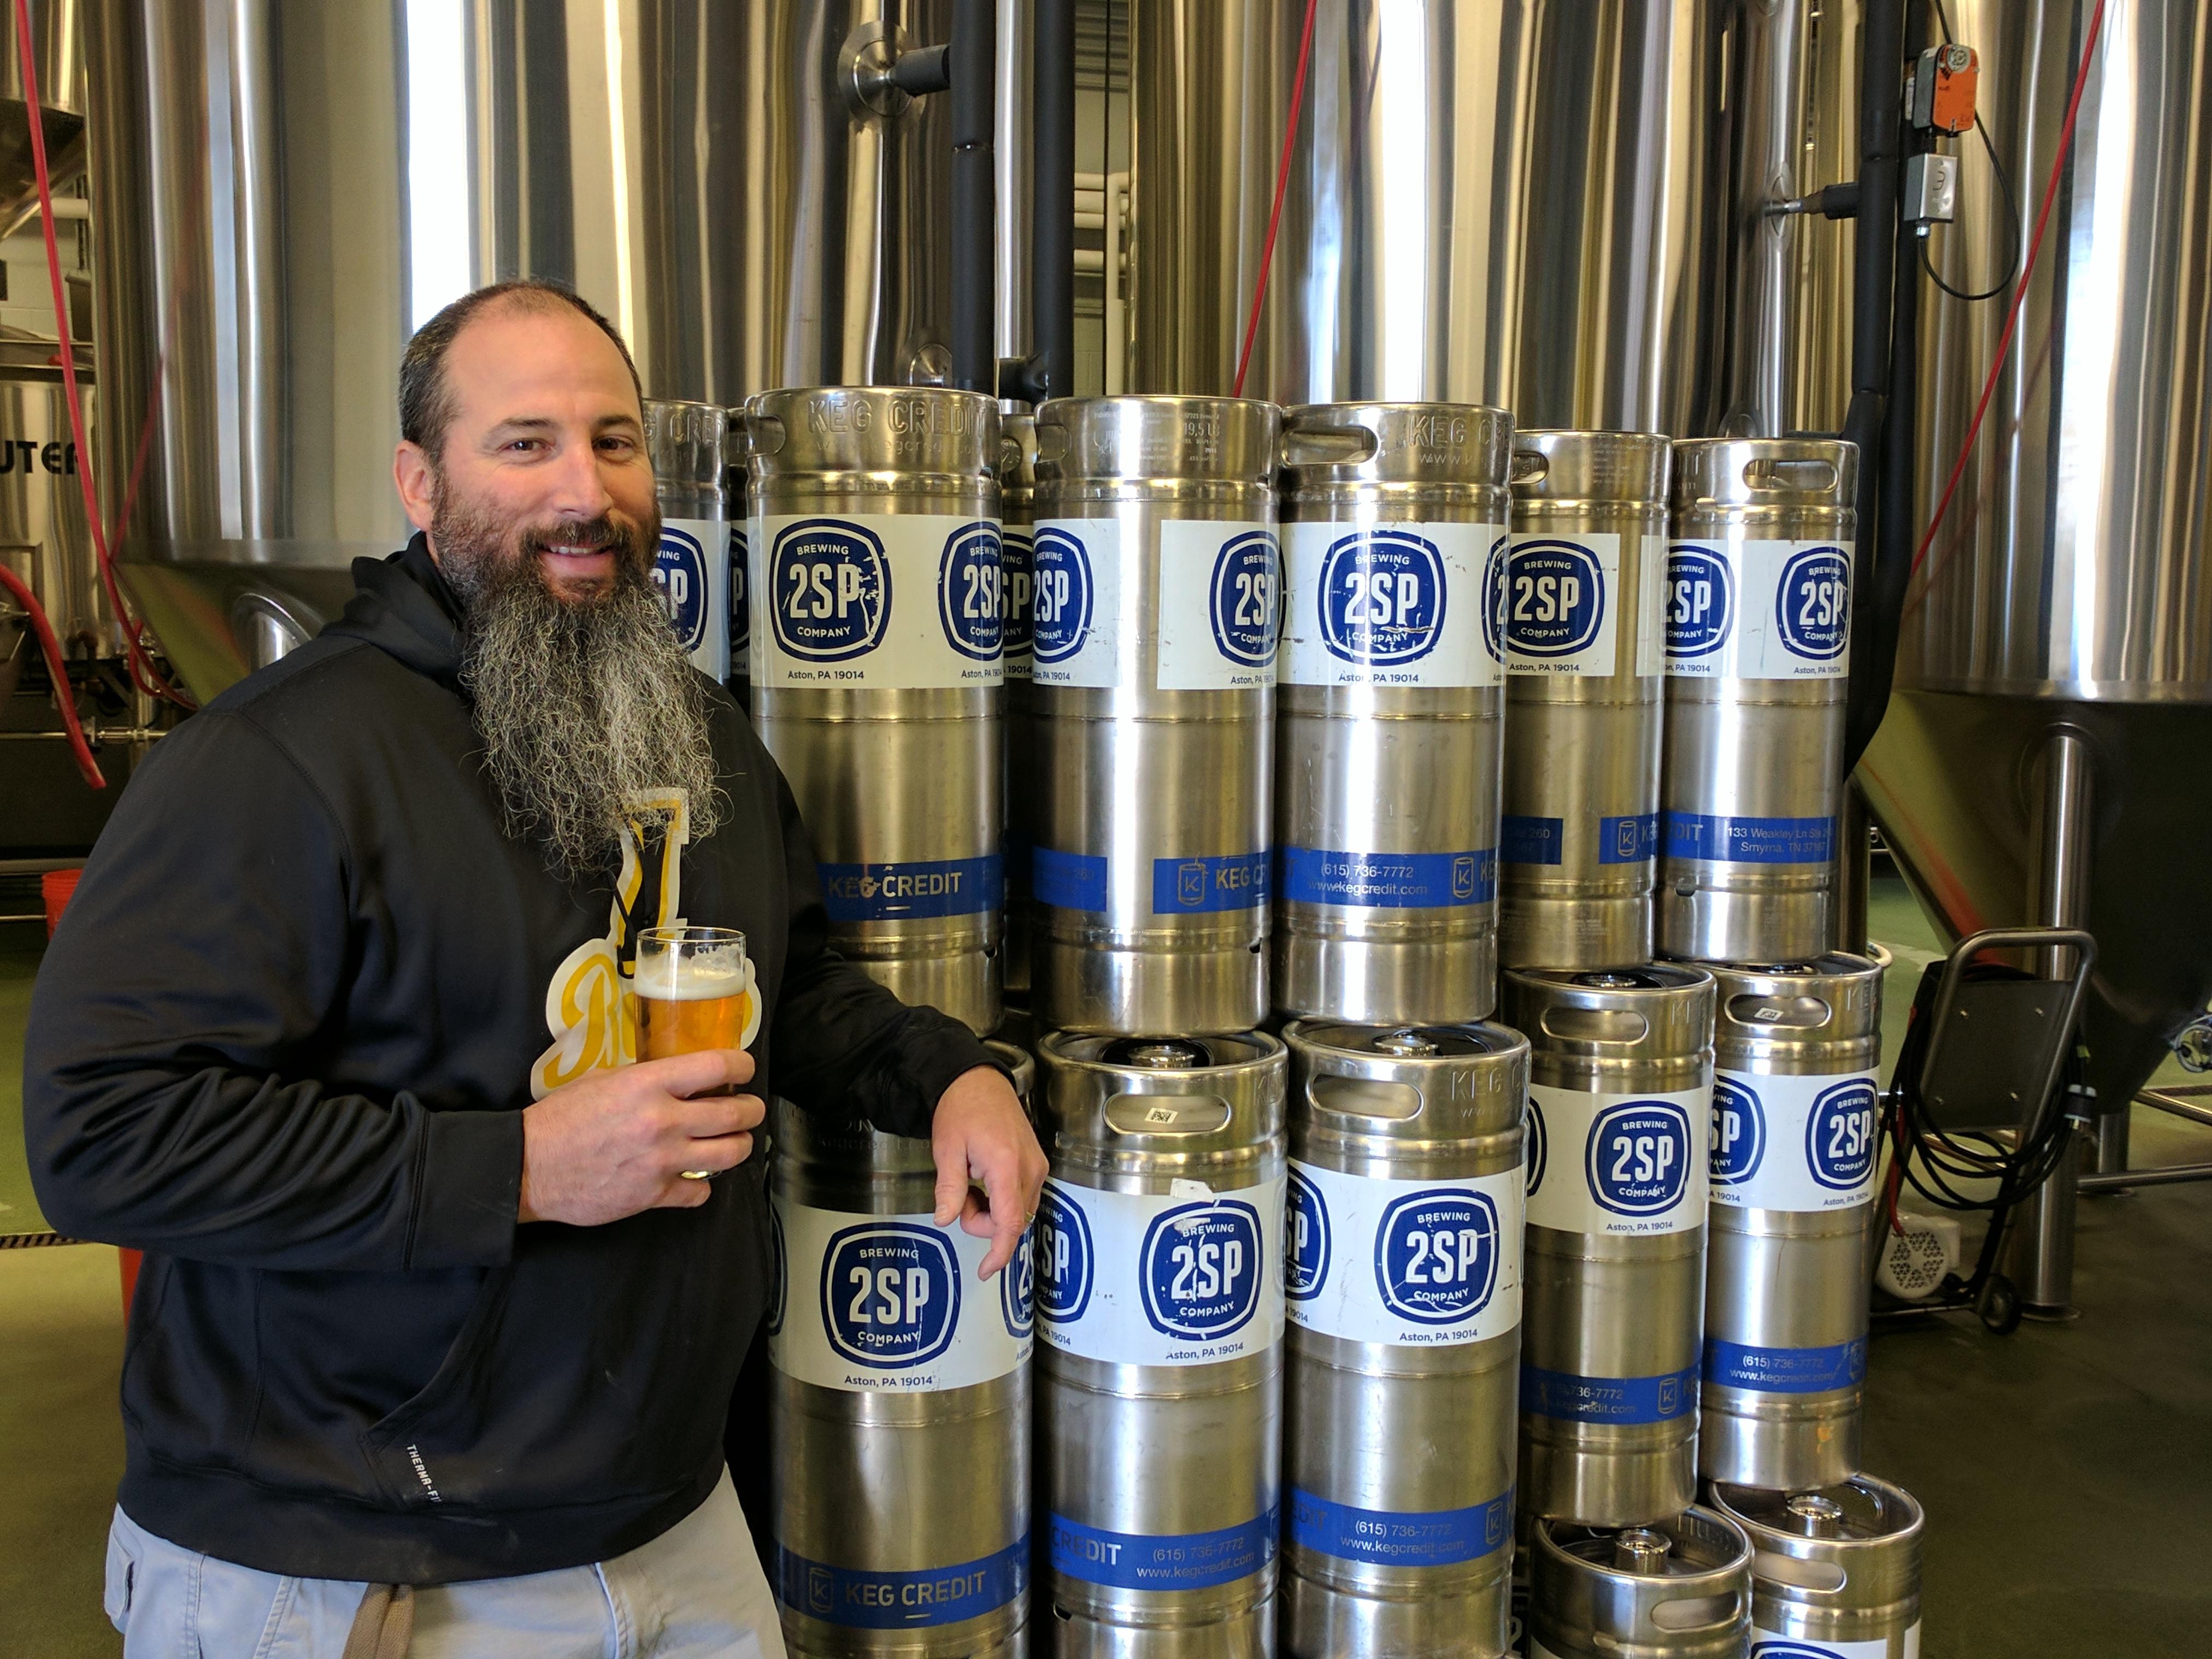 2sp-brewing-company